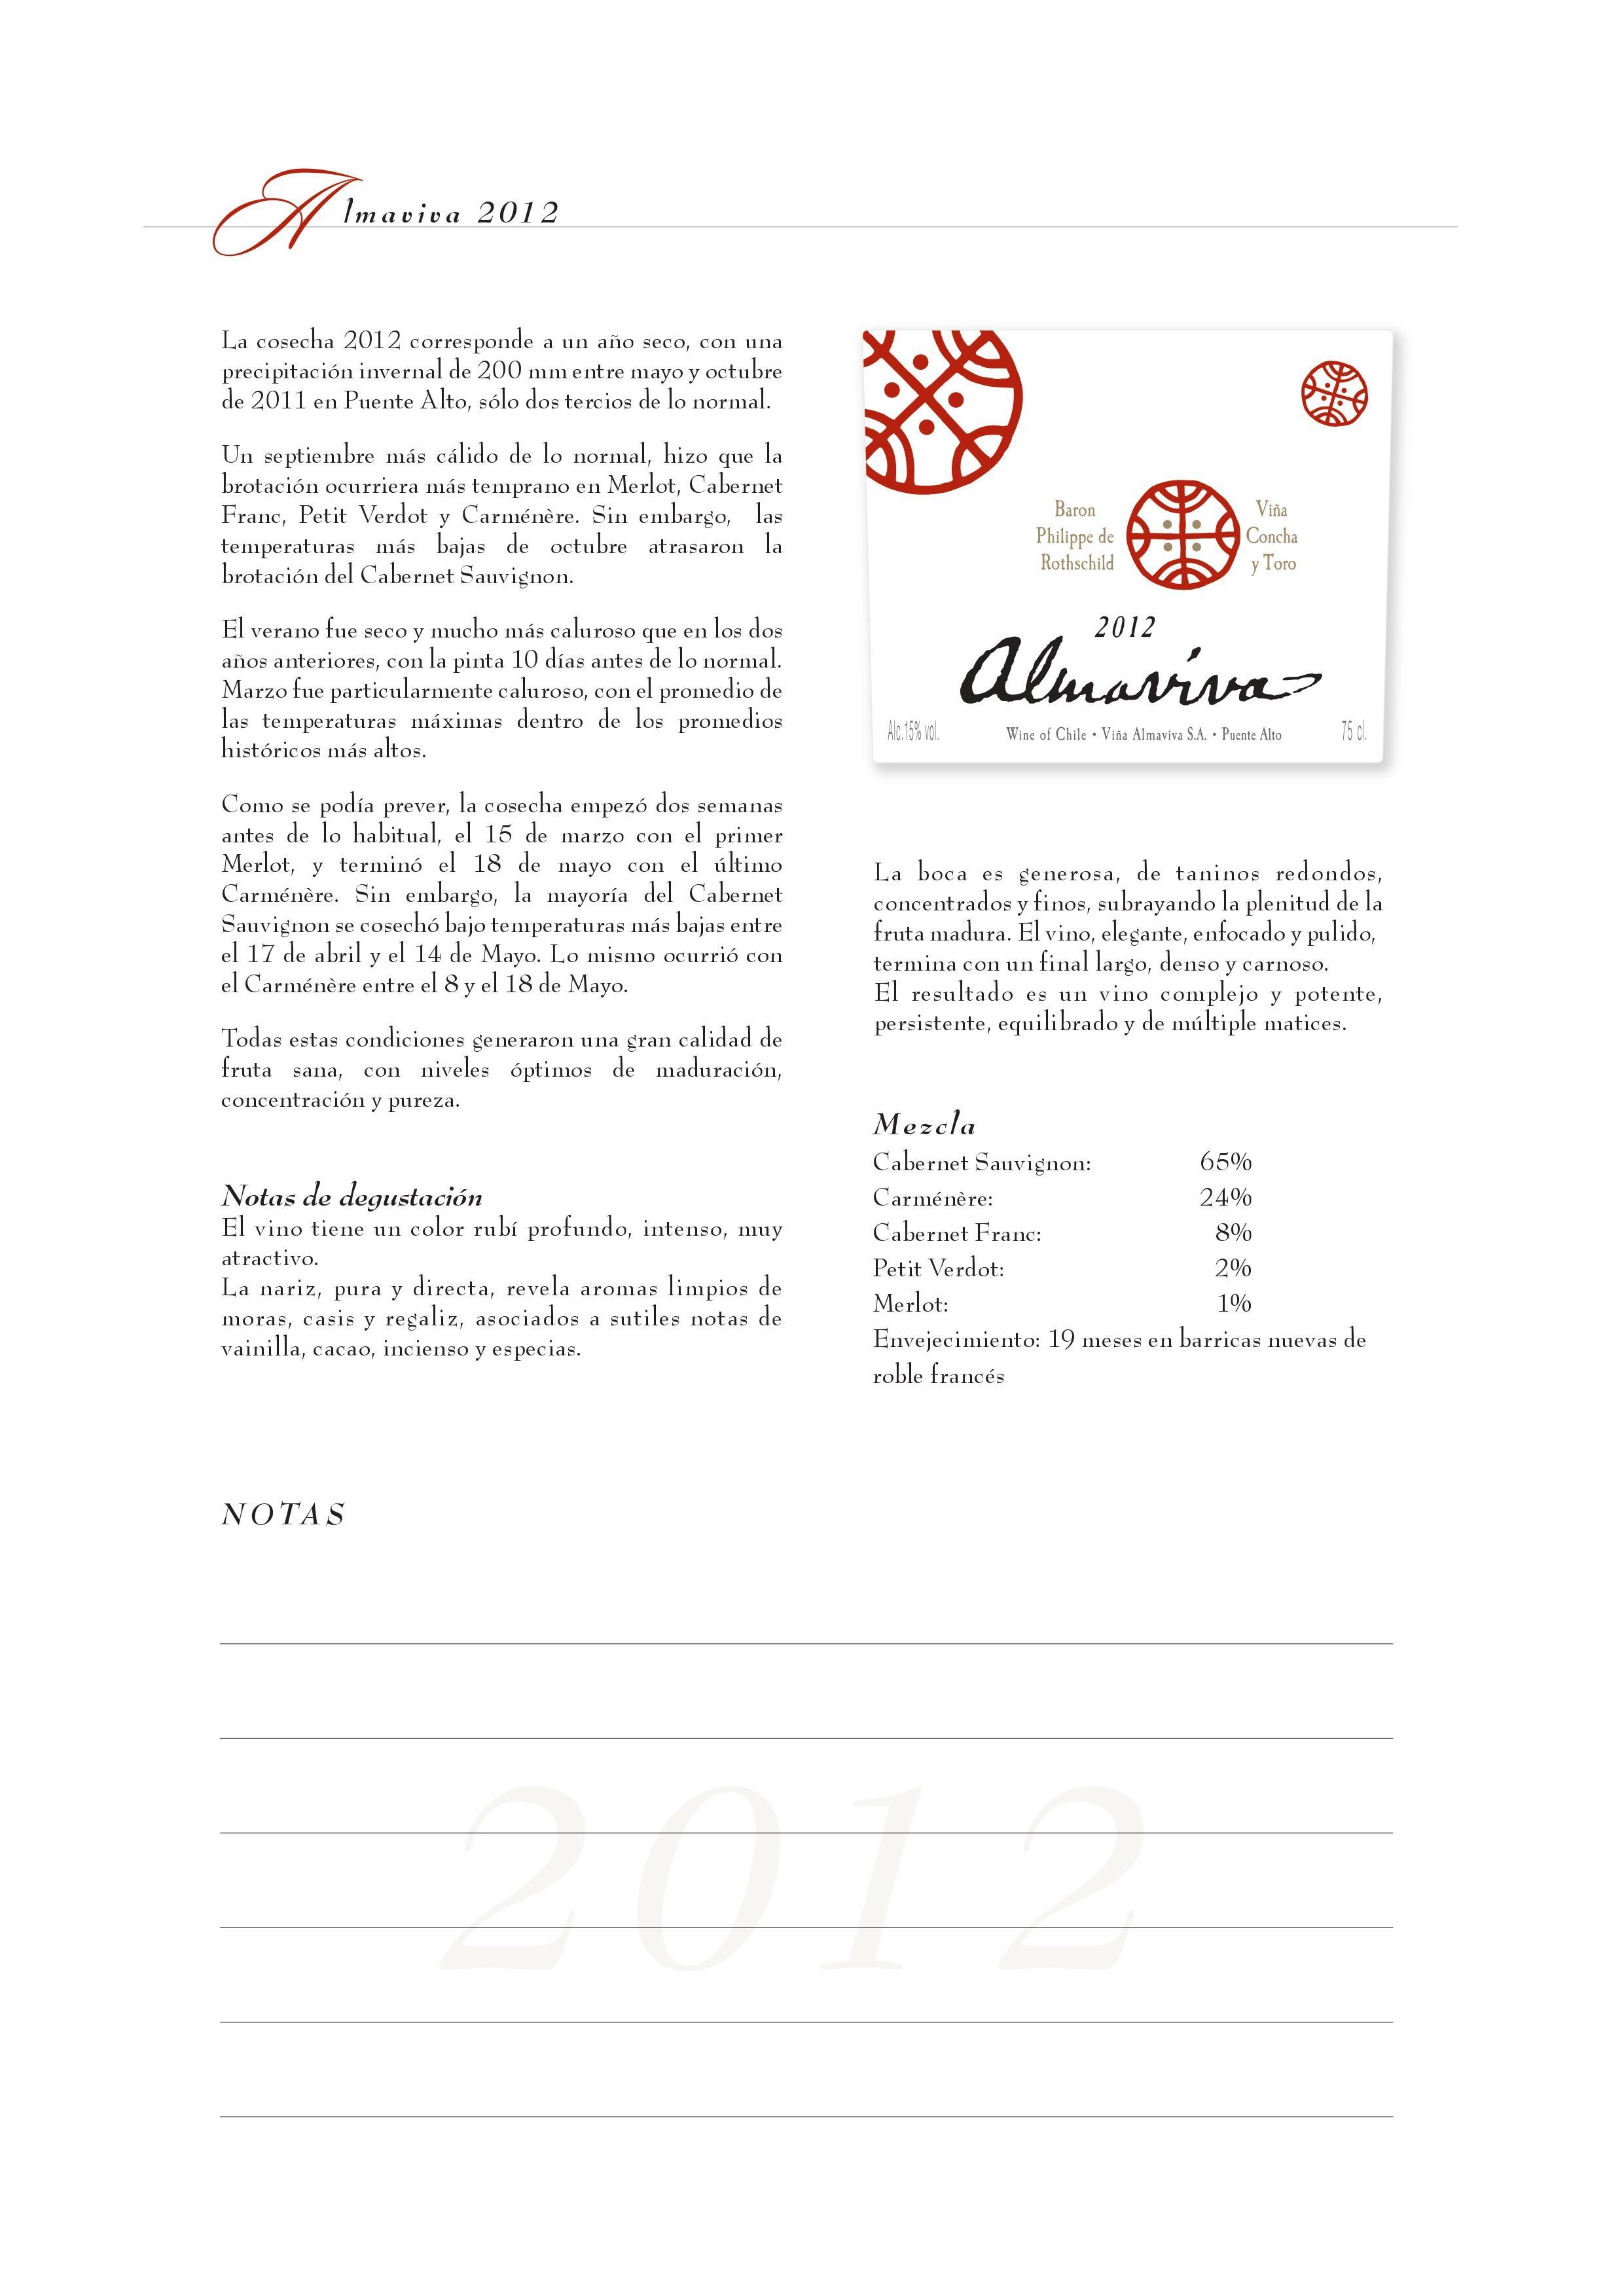 Almaviva - 2012 是一款年輕的紅葡萄酒,濃郁的香氣從杯中散發出來,從黑色水果擴展到香料,果仁和鐵質礦石的味道。如同Puente Alto葡萄園的炎熱下午一樣,葡萄酒同樣帶一點乾旱塵土的感覺。酒體飽滿,單寧異常的細緻,餘味帶一點黏土,葡萄乾和黑莓的風味。質感非常細緻,典型的波爾多混釀,於2017飲用更佳。